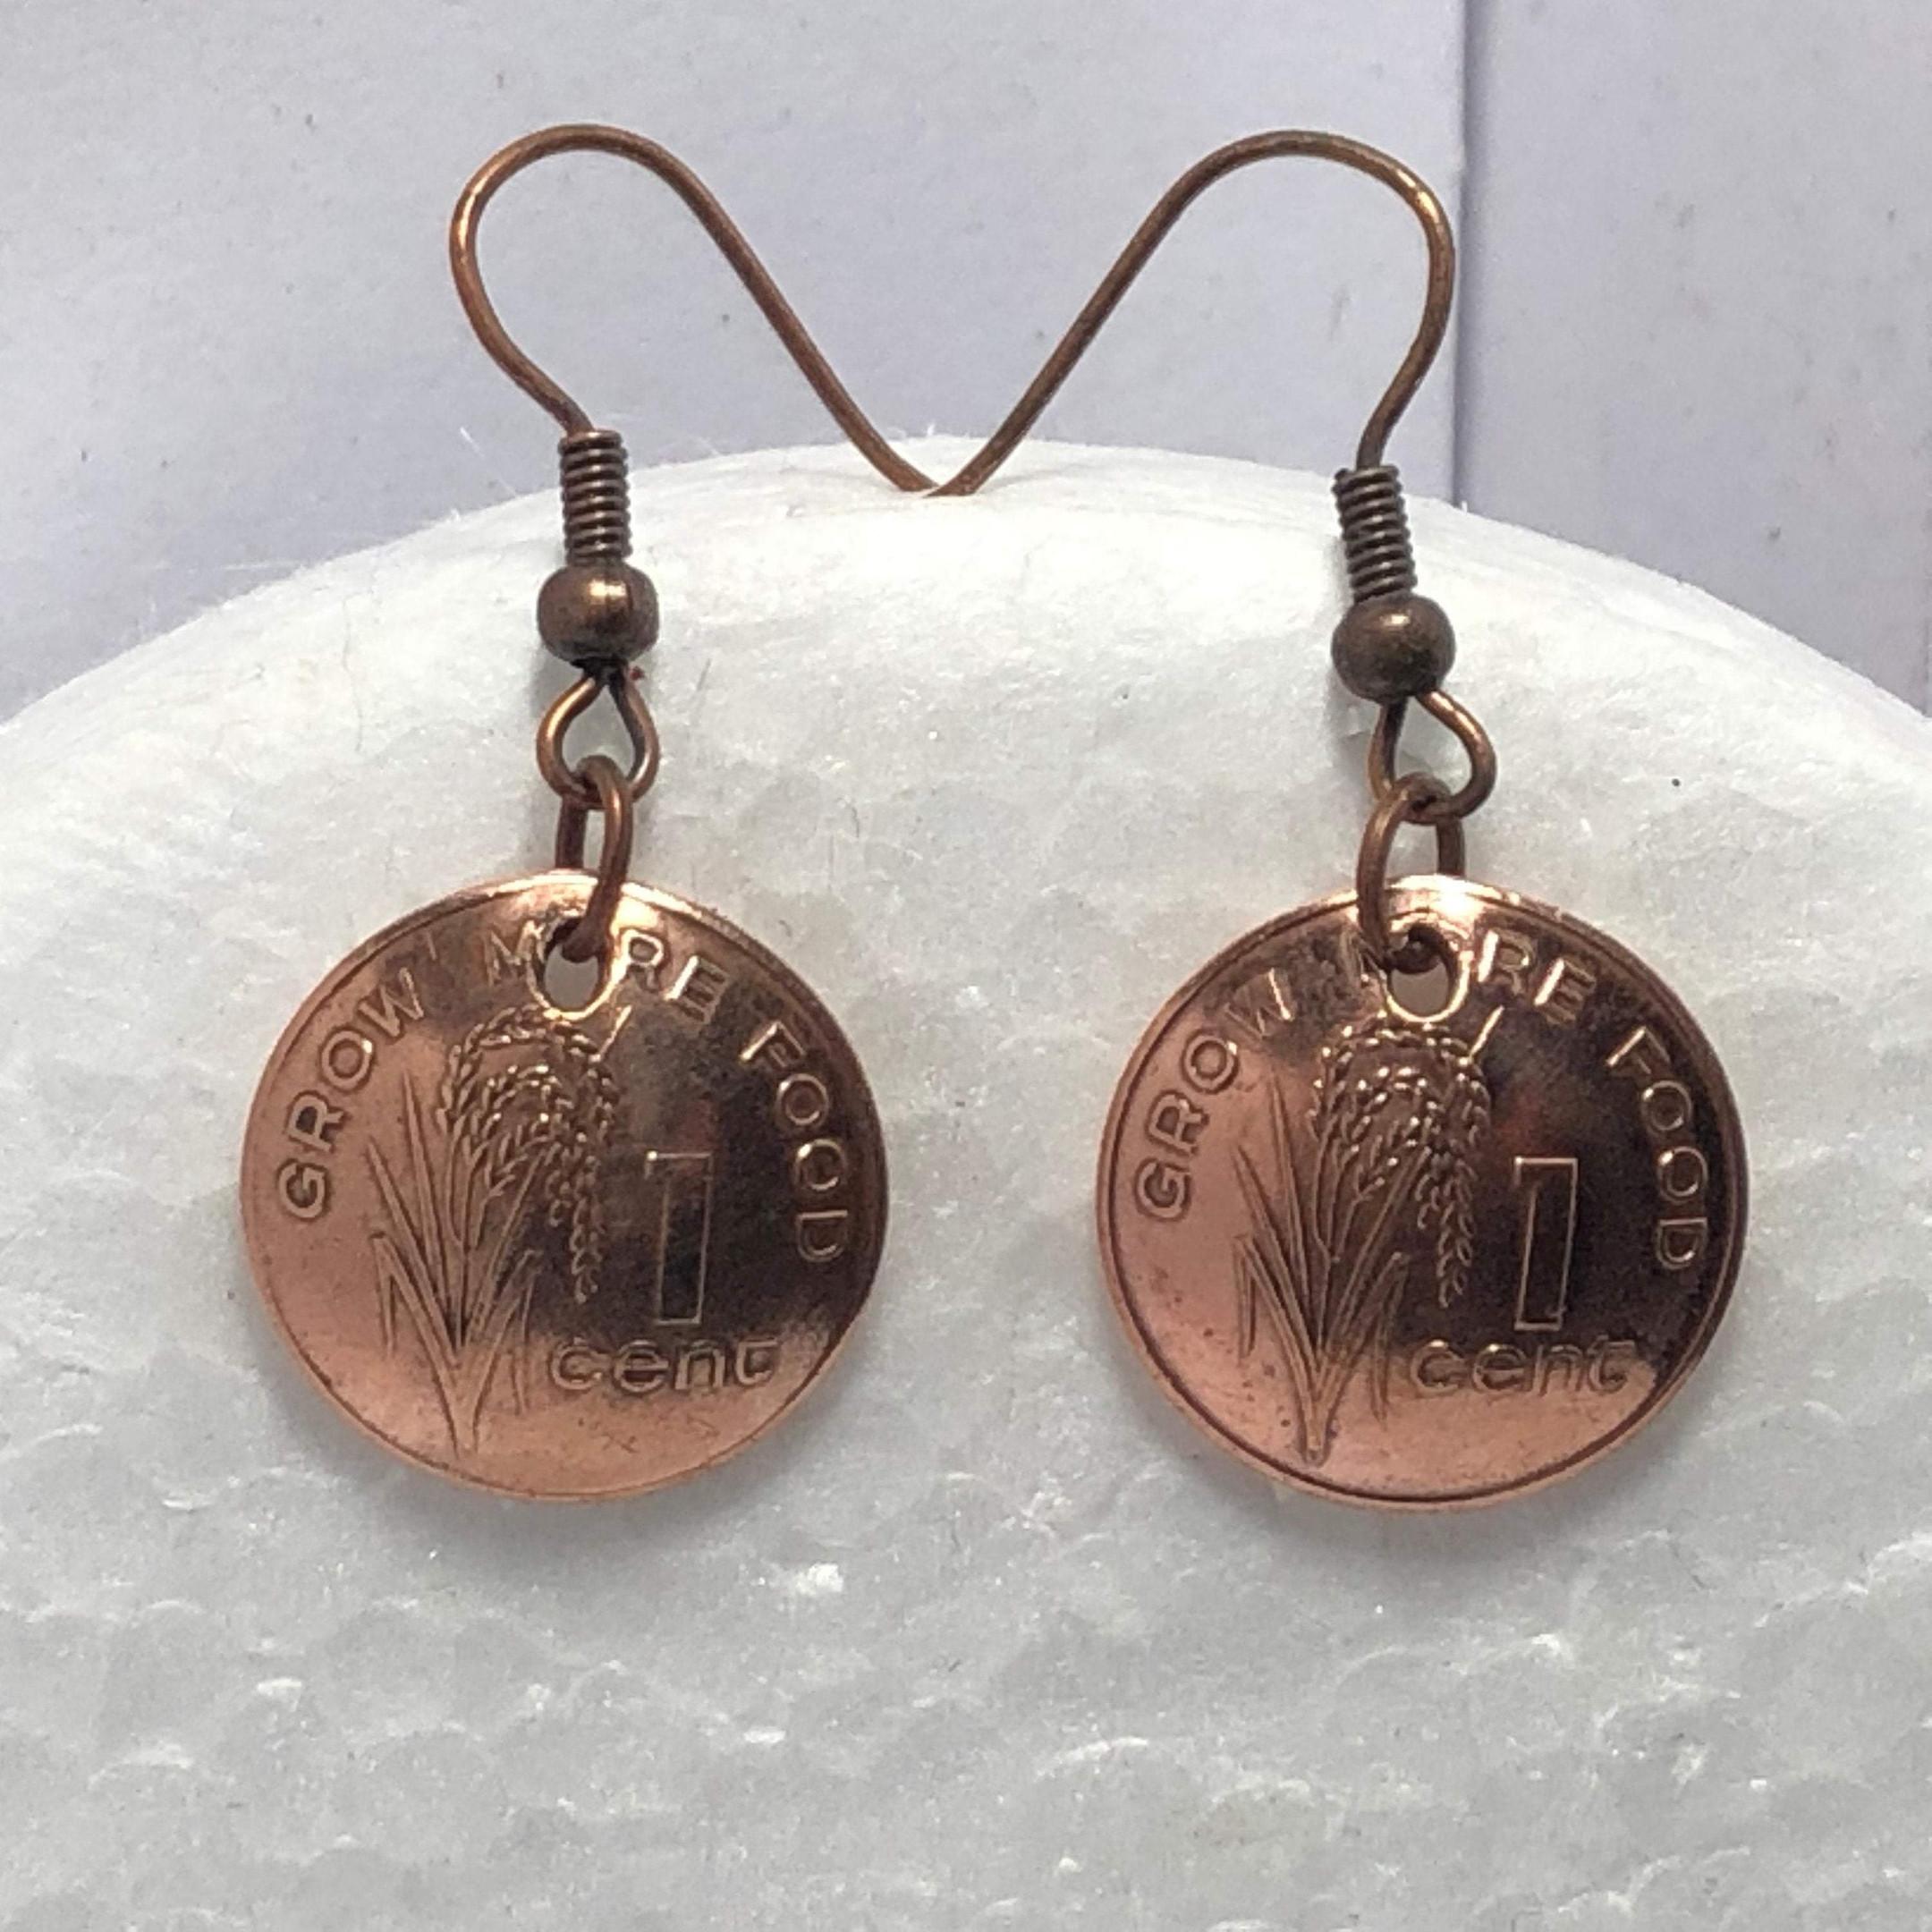 Fiji Handmade Jewelry - Grow More Food 1 Cent Coin Earrings